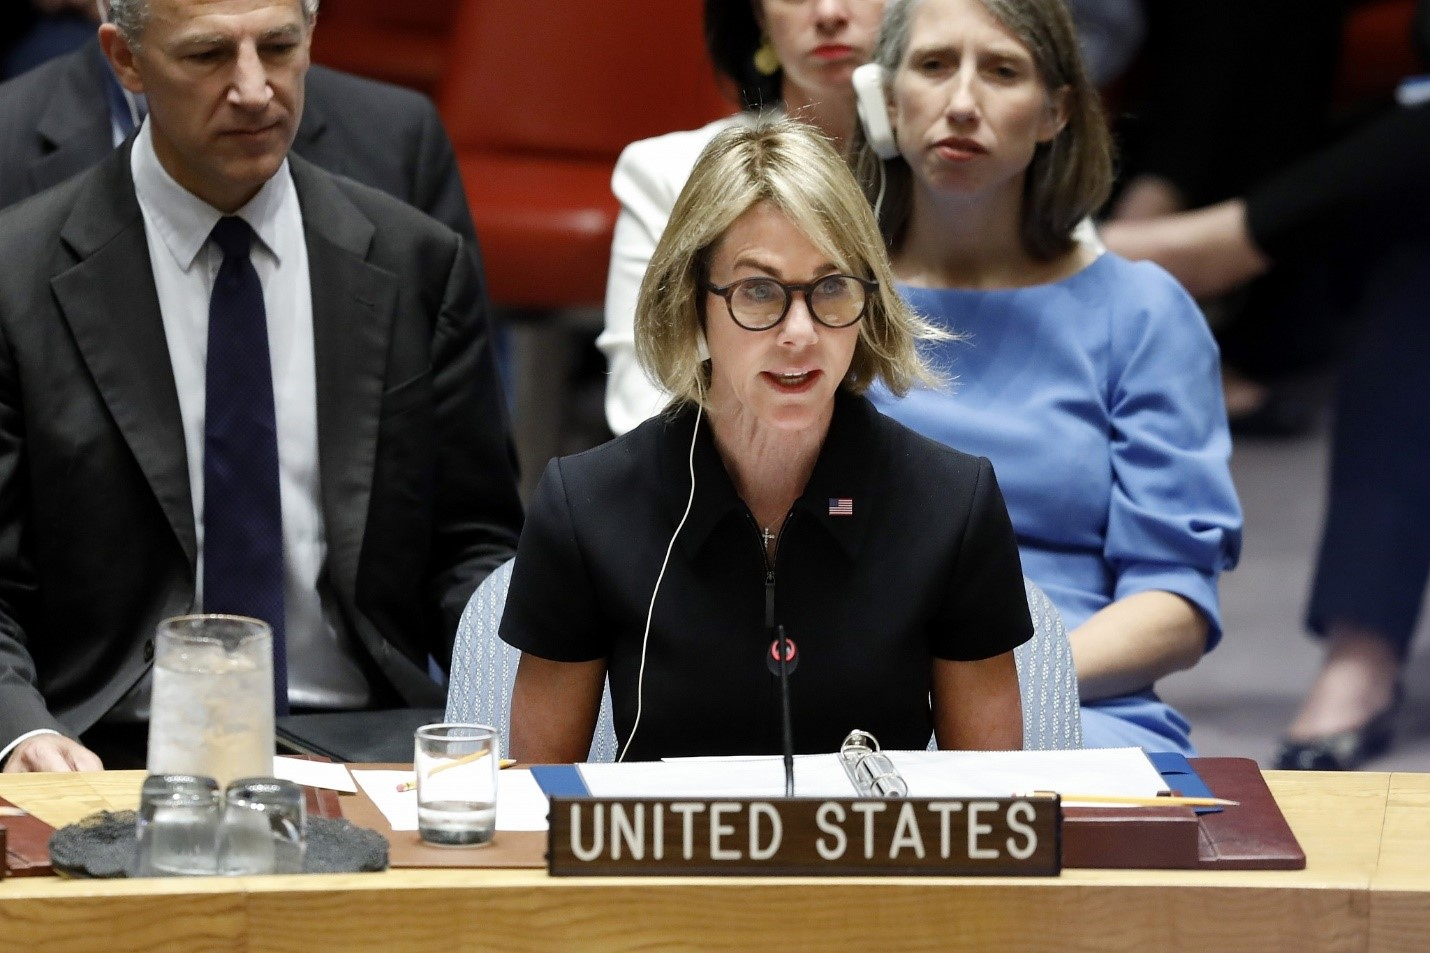 Ambassador Kelly Craft urged to push UN to act on Cameroon worsening conflict (photo: AP Photo/Richard Drew)